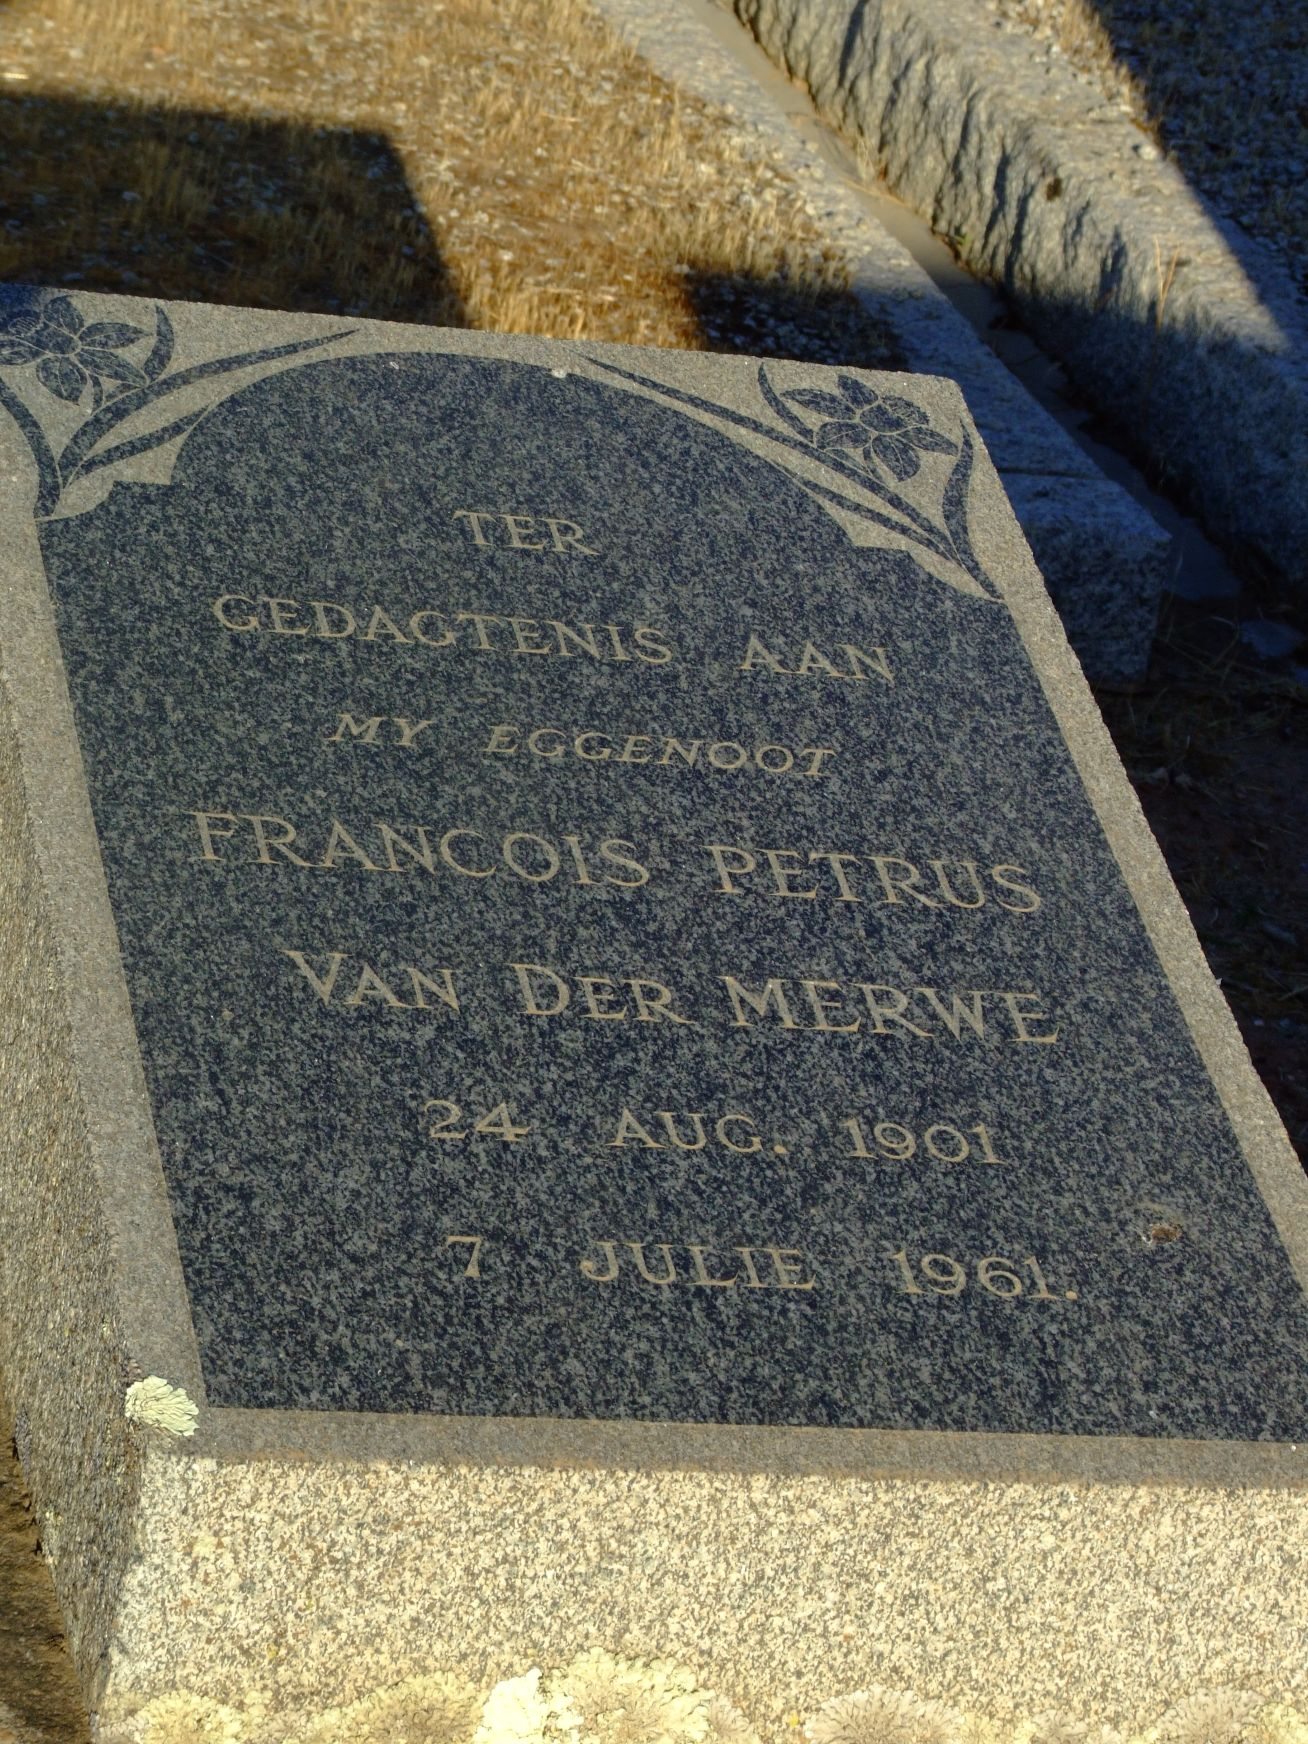 Van Der Merwe, Francois Petrus